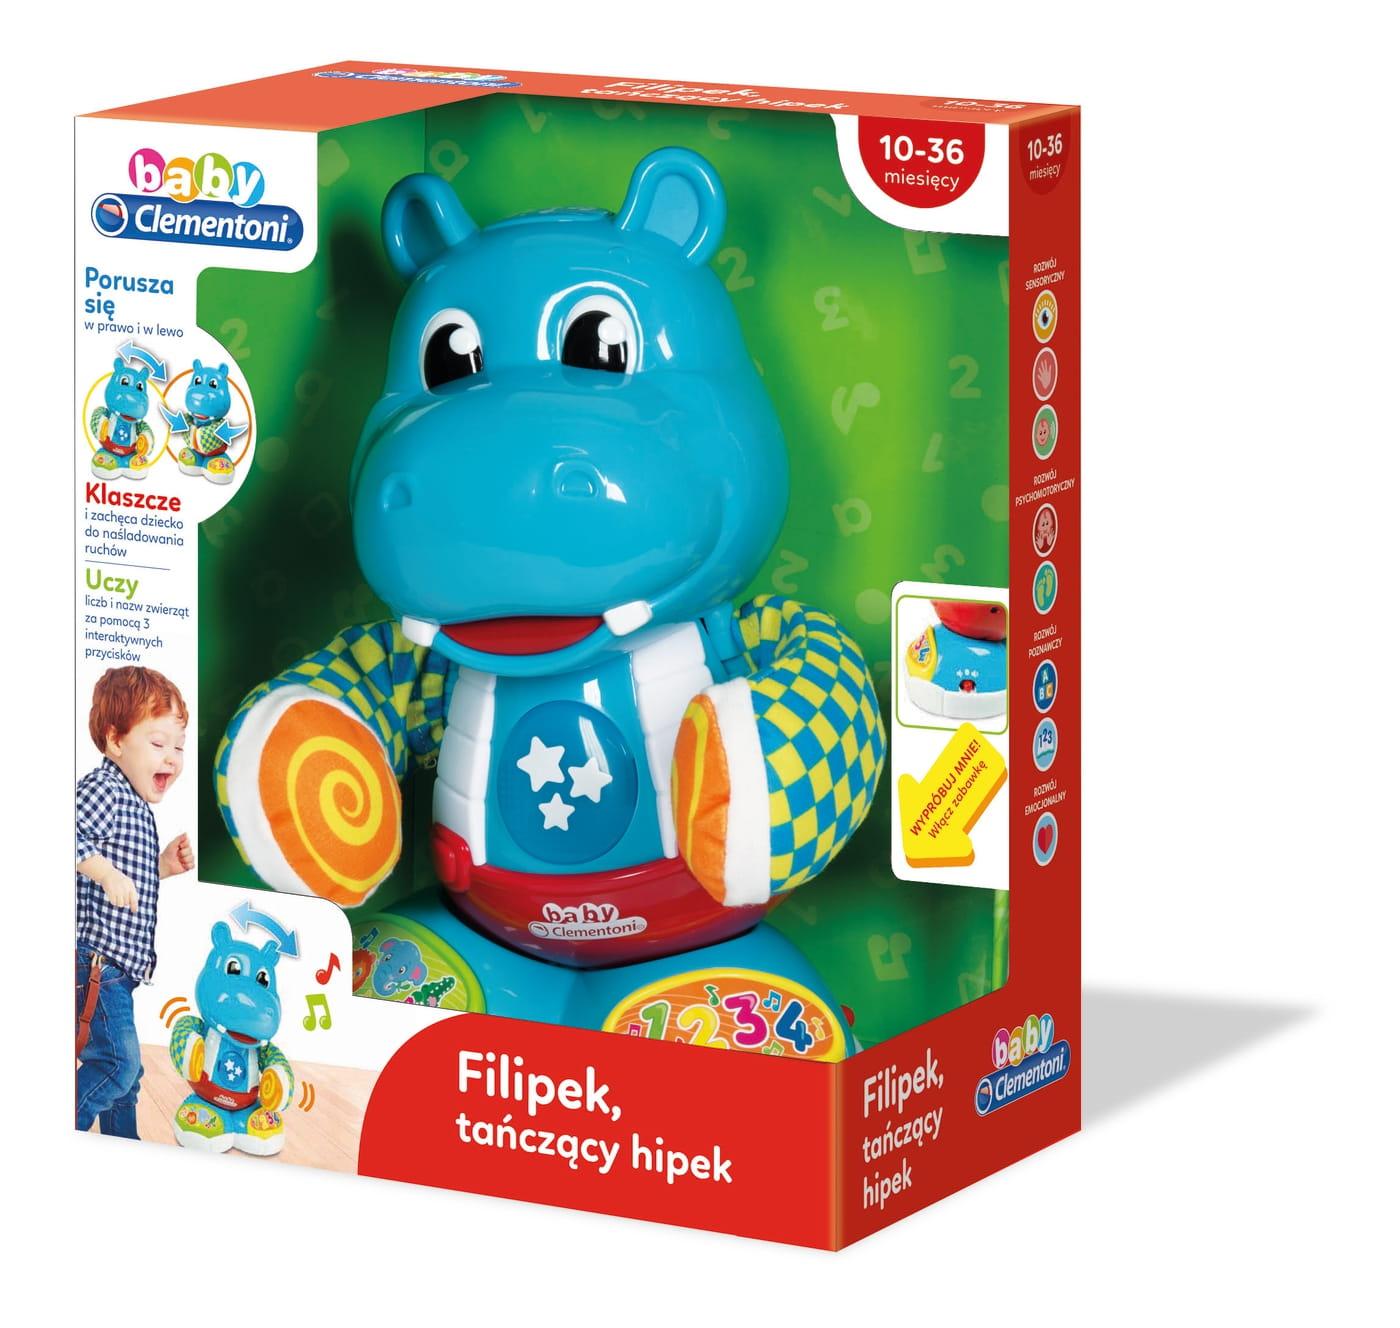 Zabawka Edukacyjna Filipek Tanczacy Hipek Clementoni Sklep